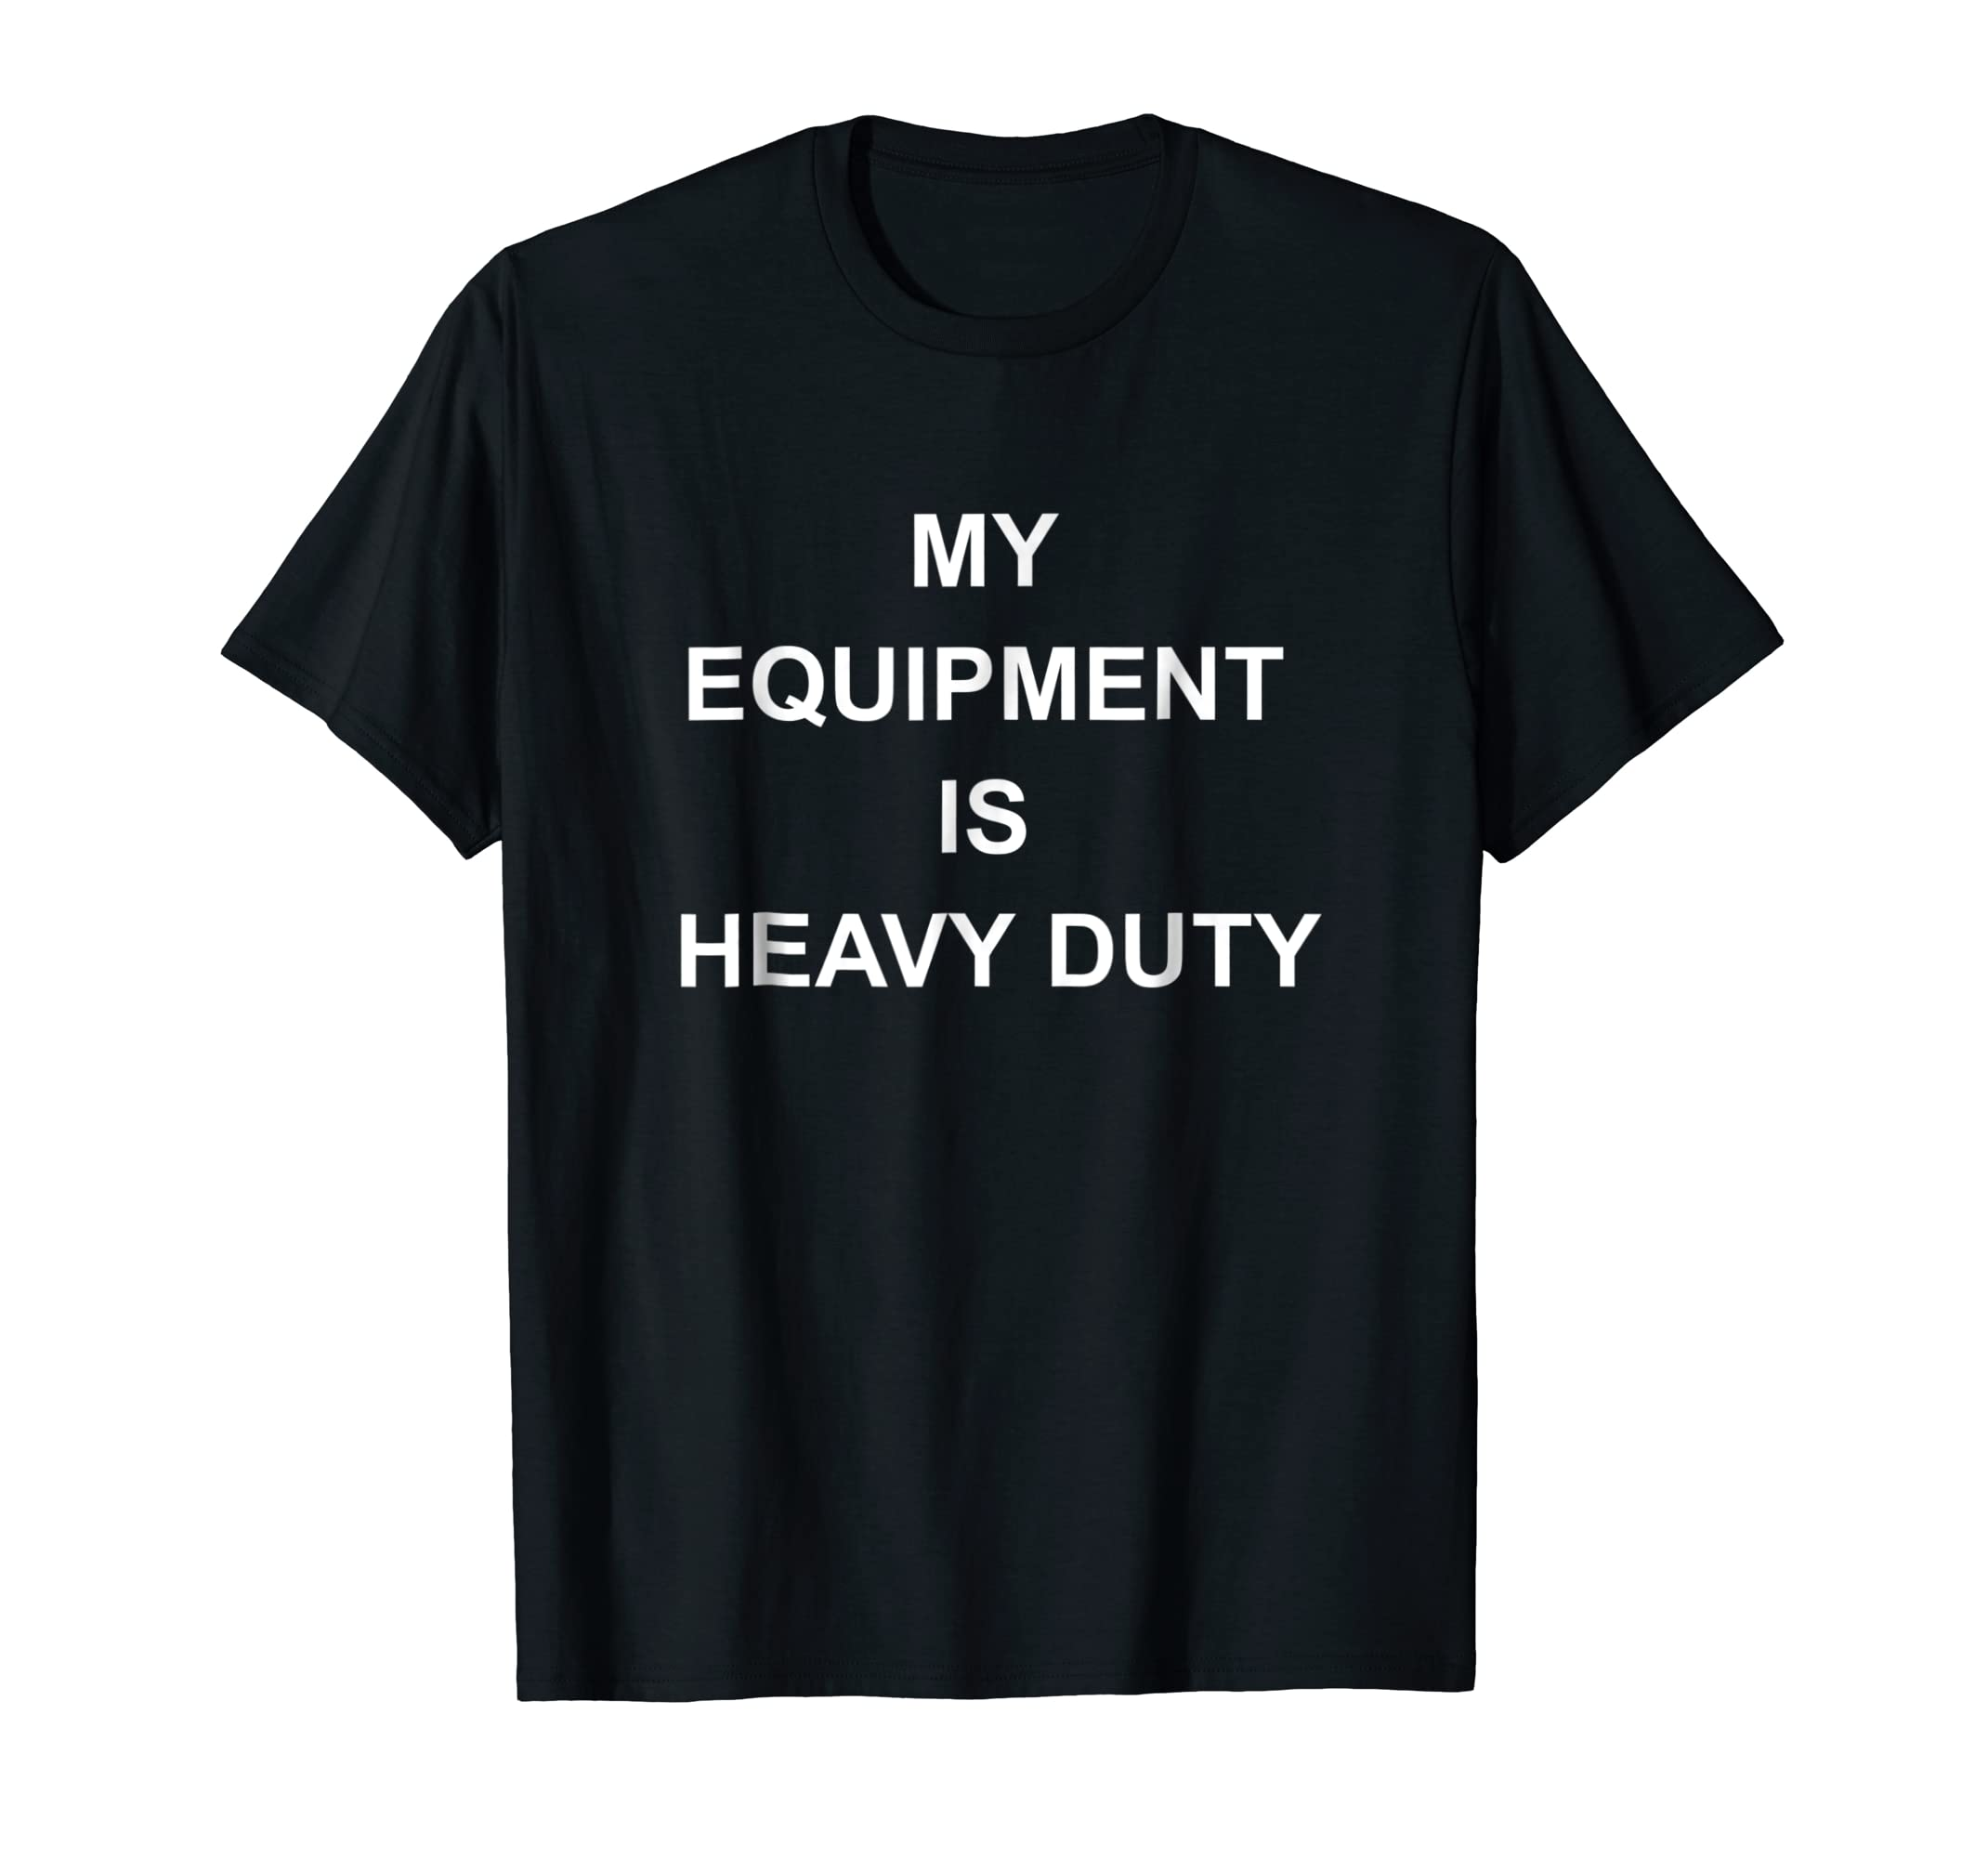 88f36f64bba Amazon.com  MY EQUIPMENT IS HEAVY DUTY T-Shirt - Cool Machinist Gift Tee   Clothing